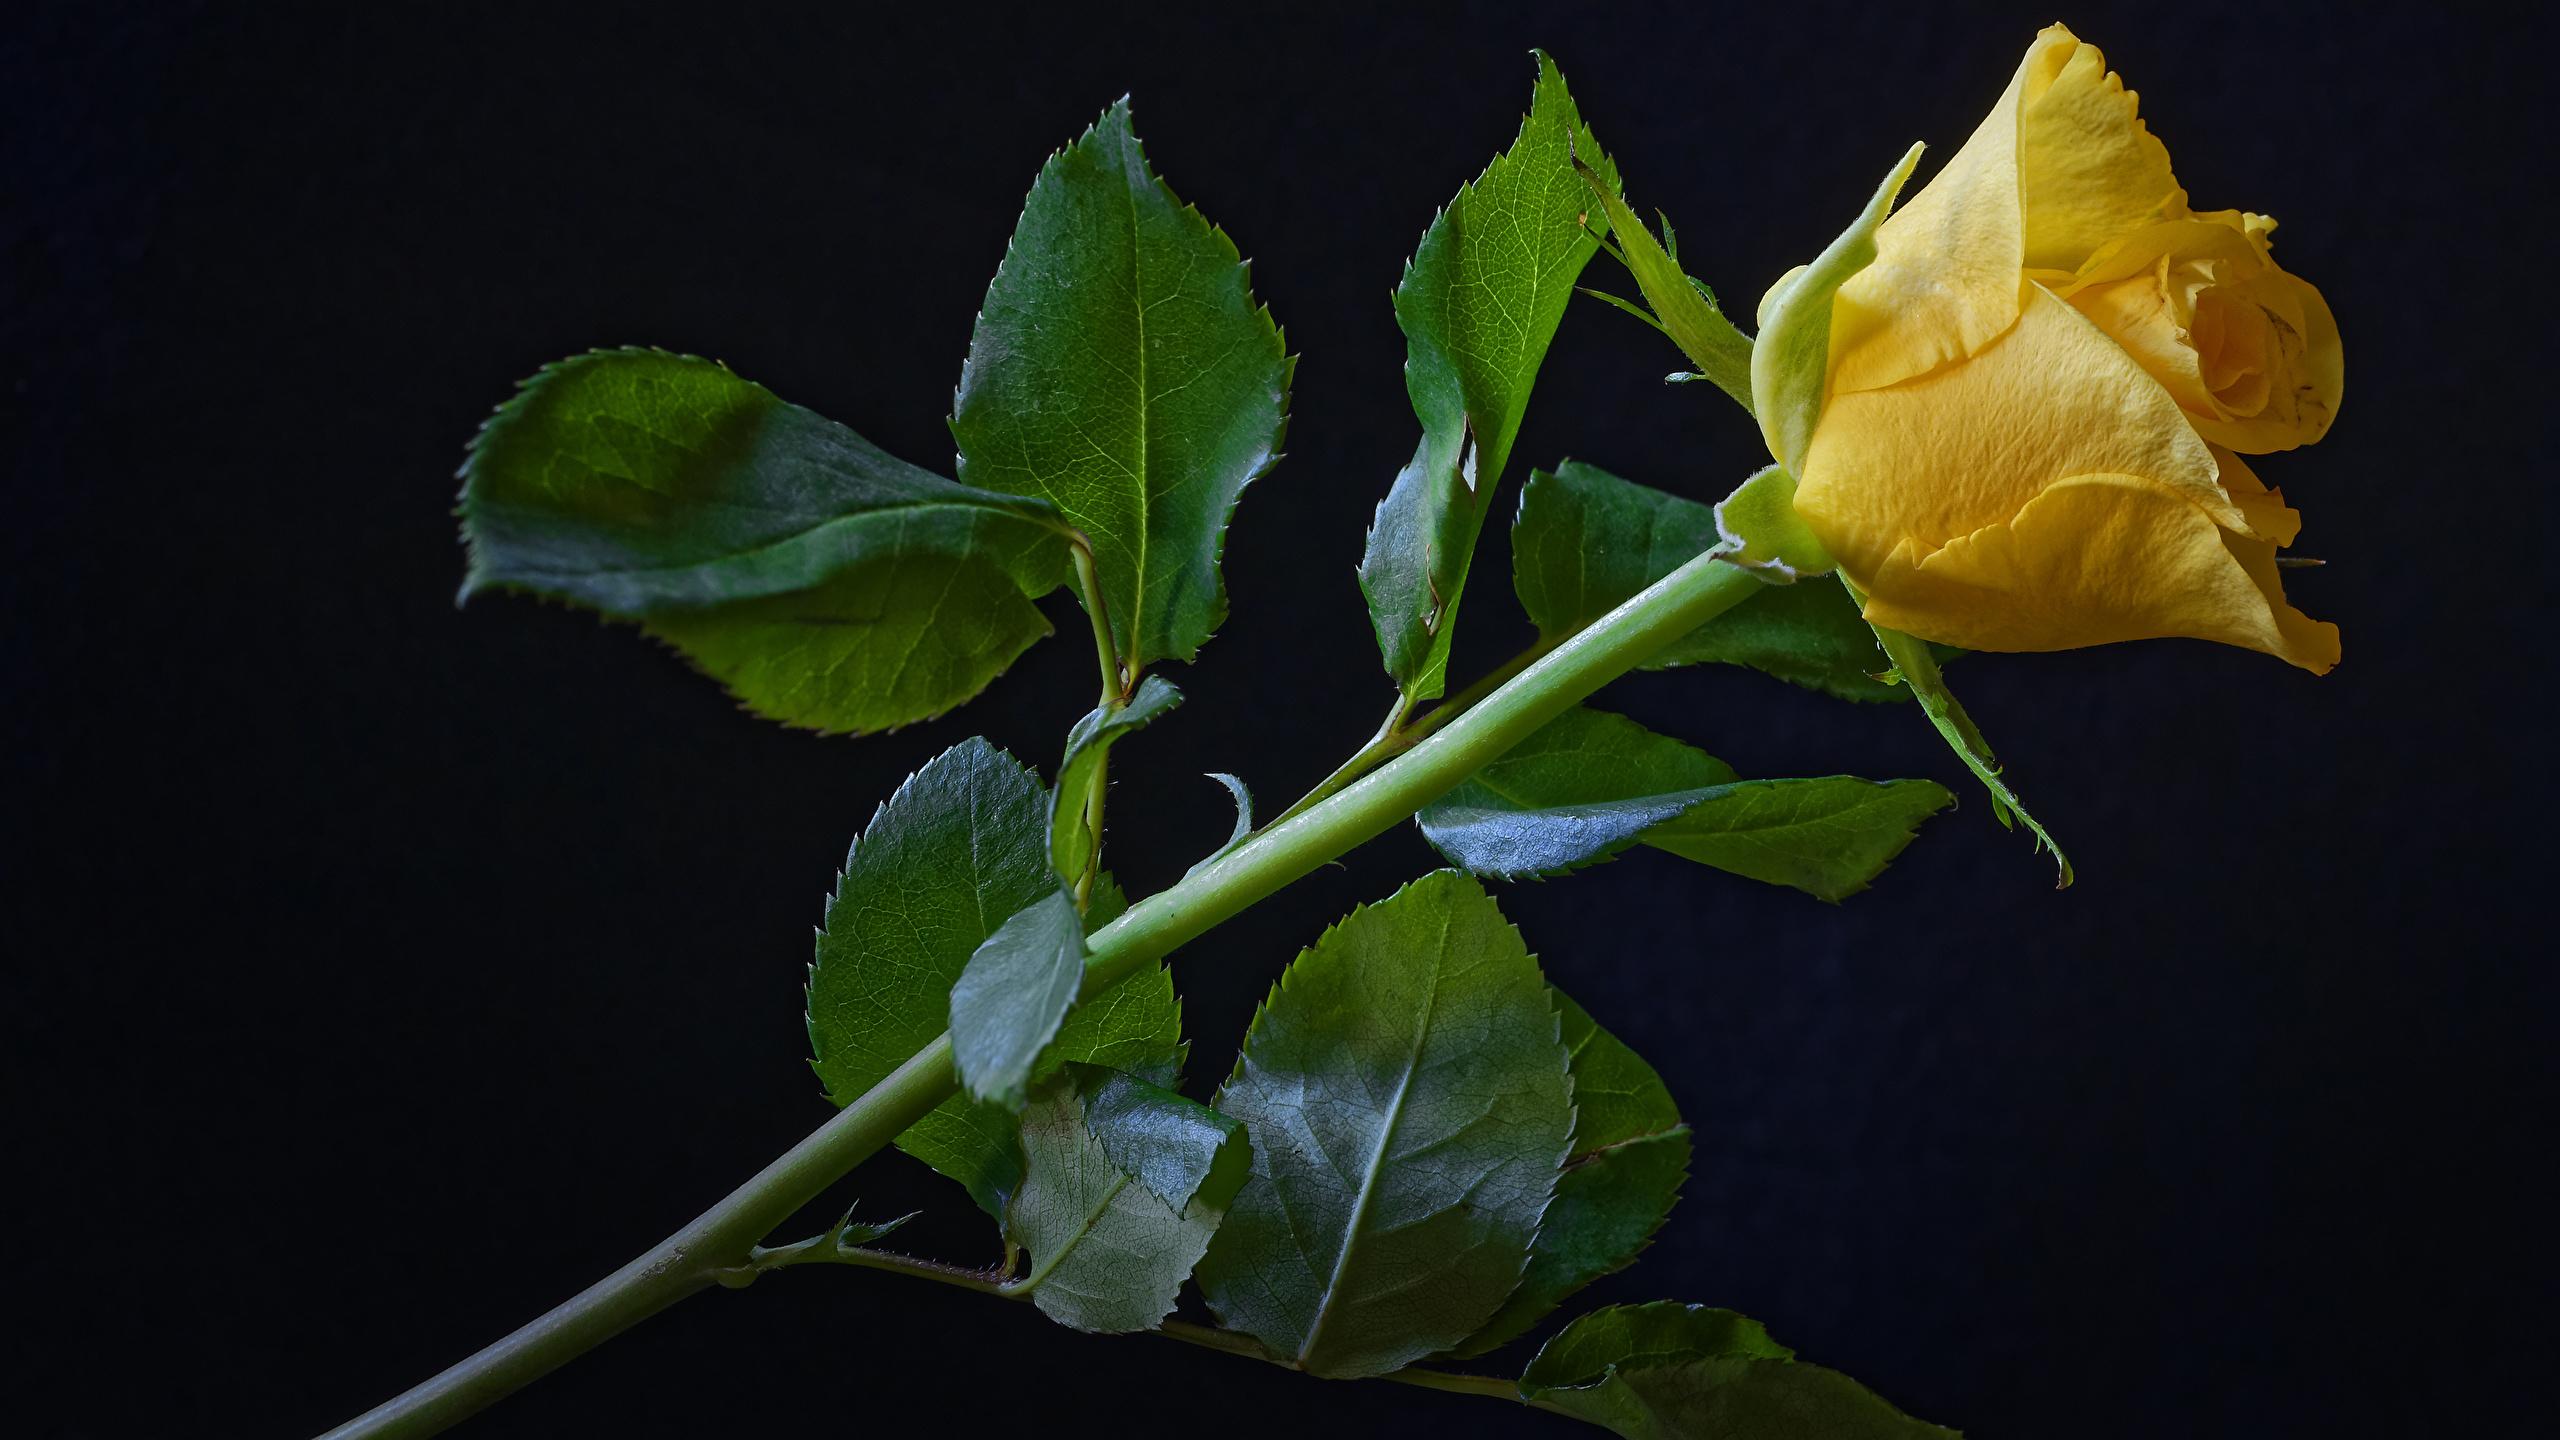 Desktop Wallpapers Roses Yellow Flowers Closeup Black 2560x1440